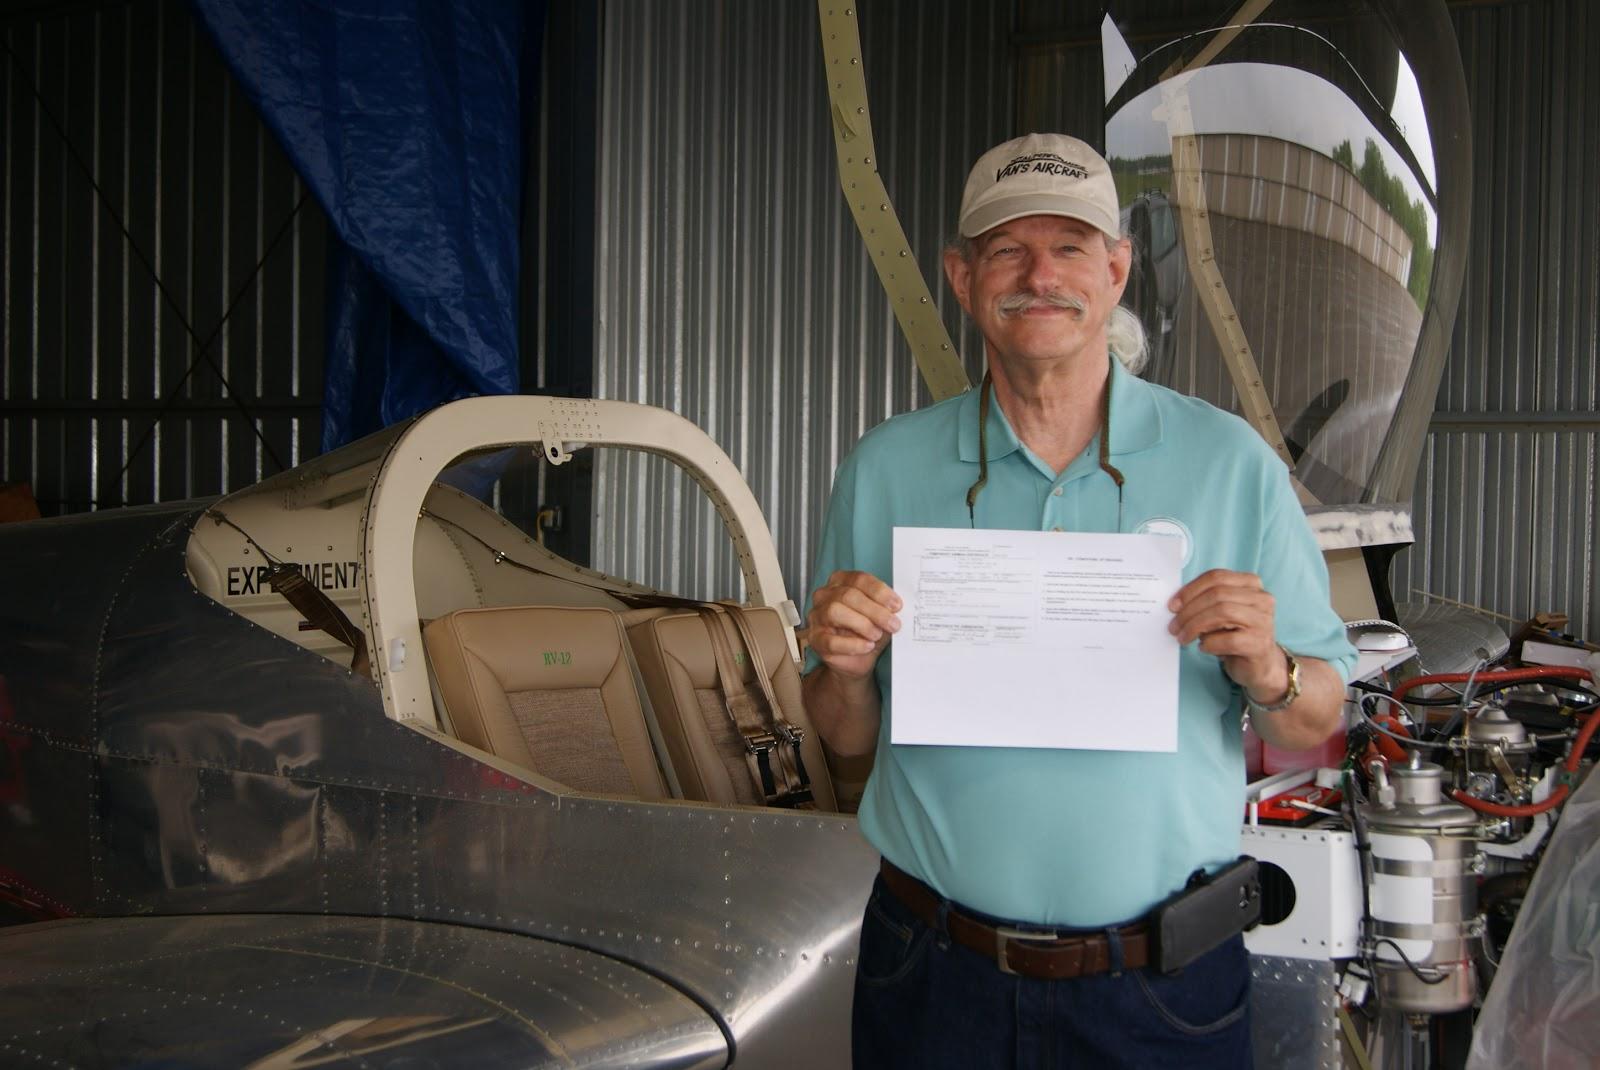 Dog Aviation Johns Rv 12 Blog Repairman Certificate Granted By Faa